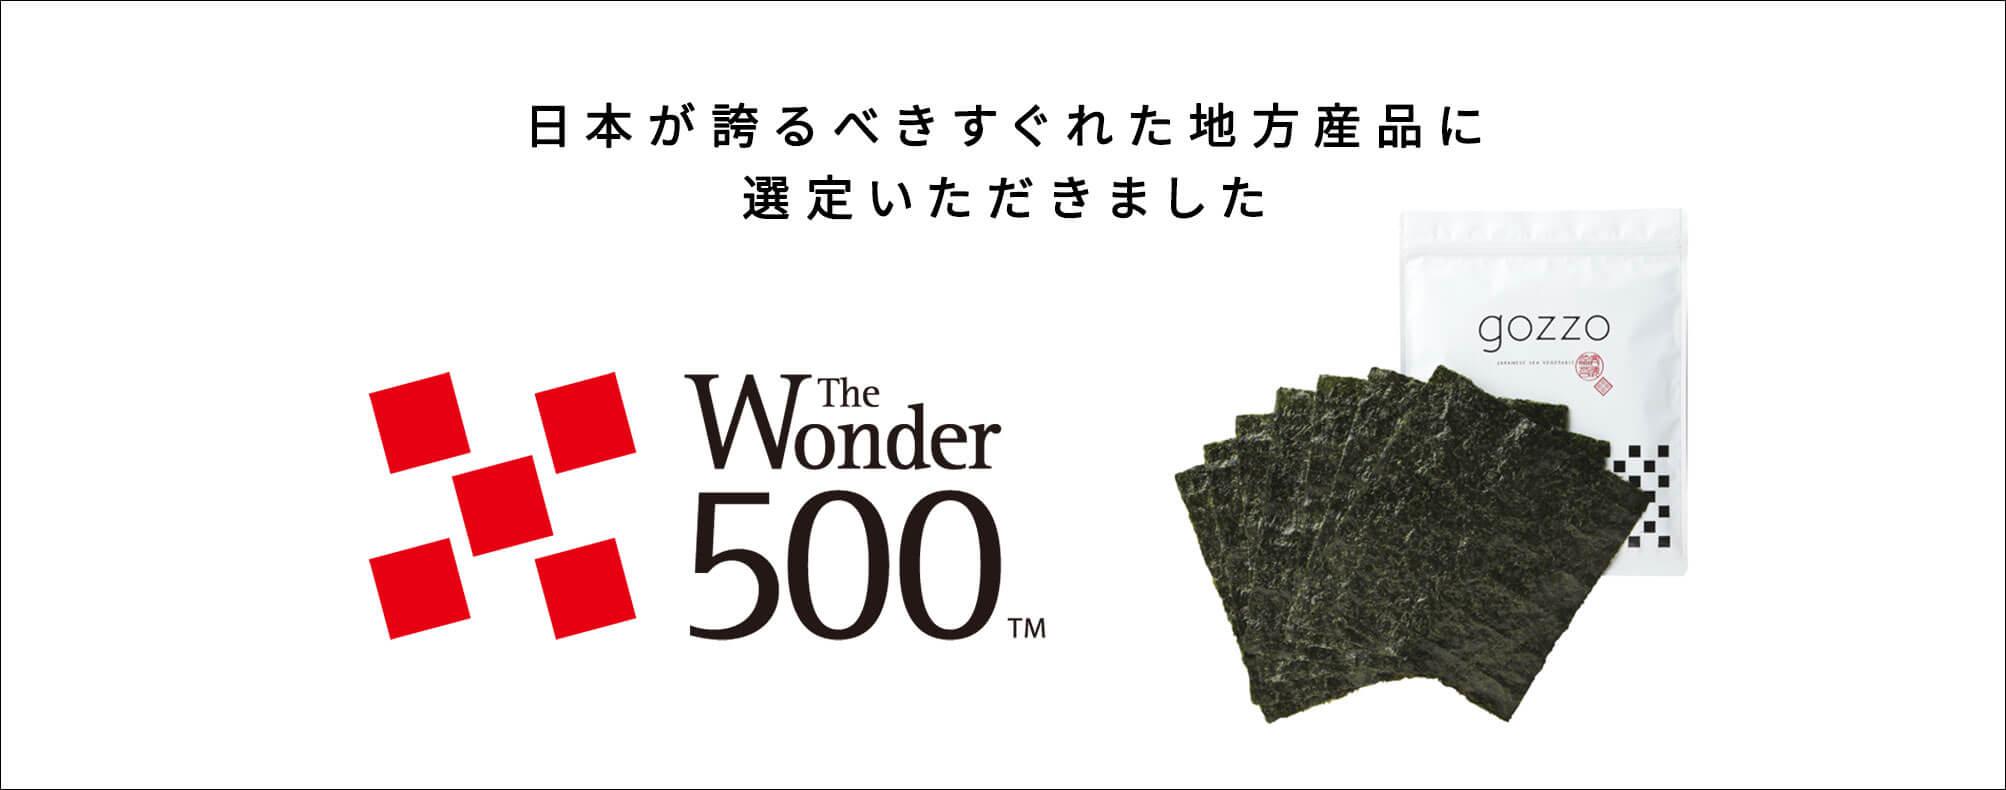 The Wondor 500 選定 優れた地方産品